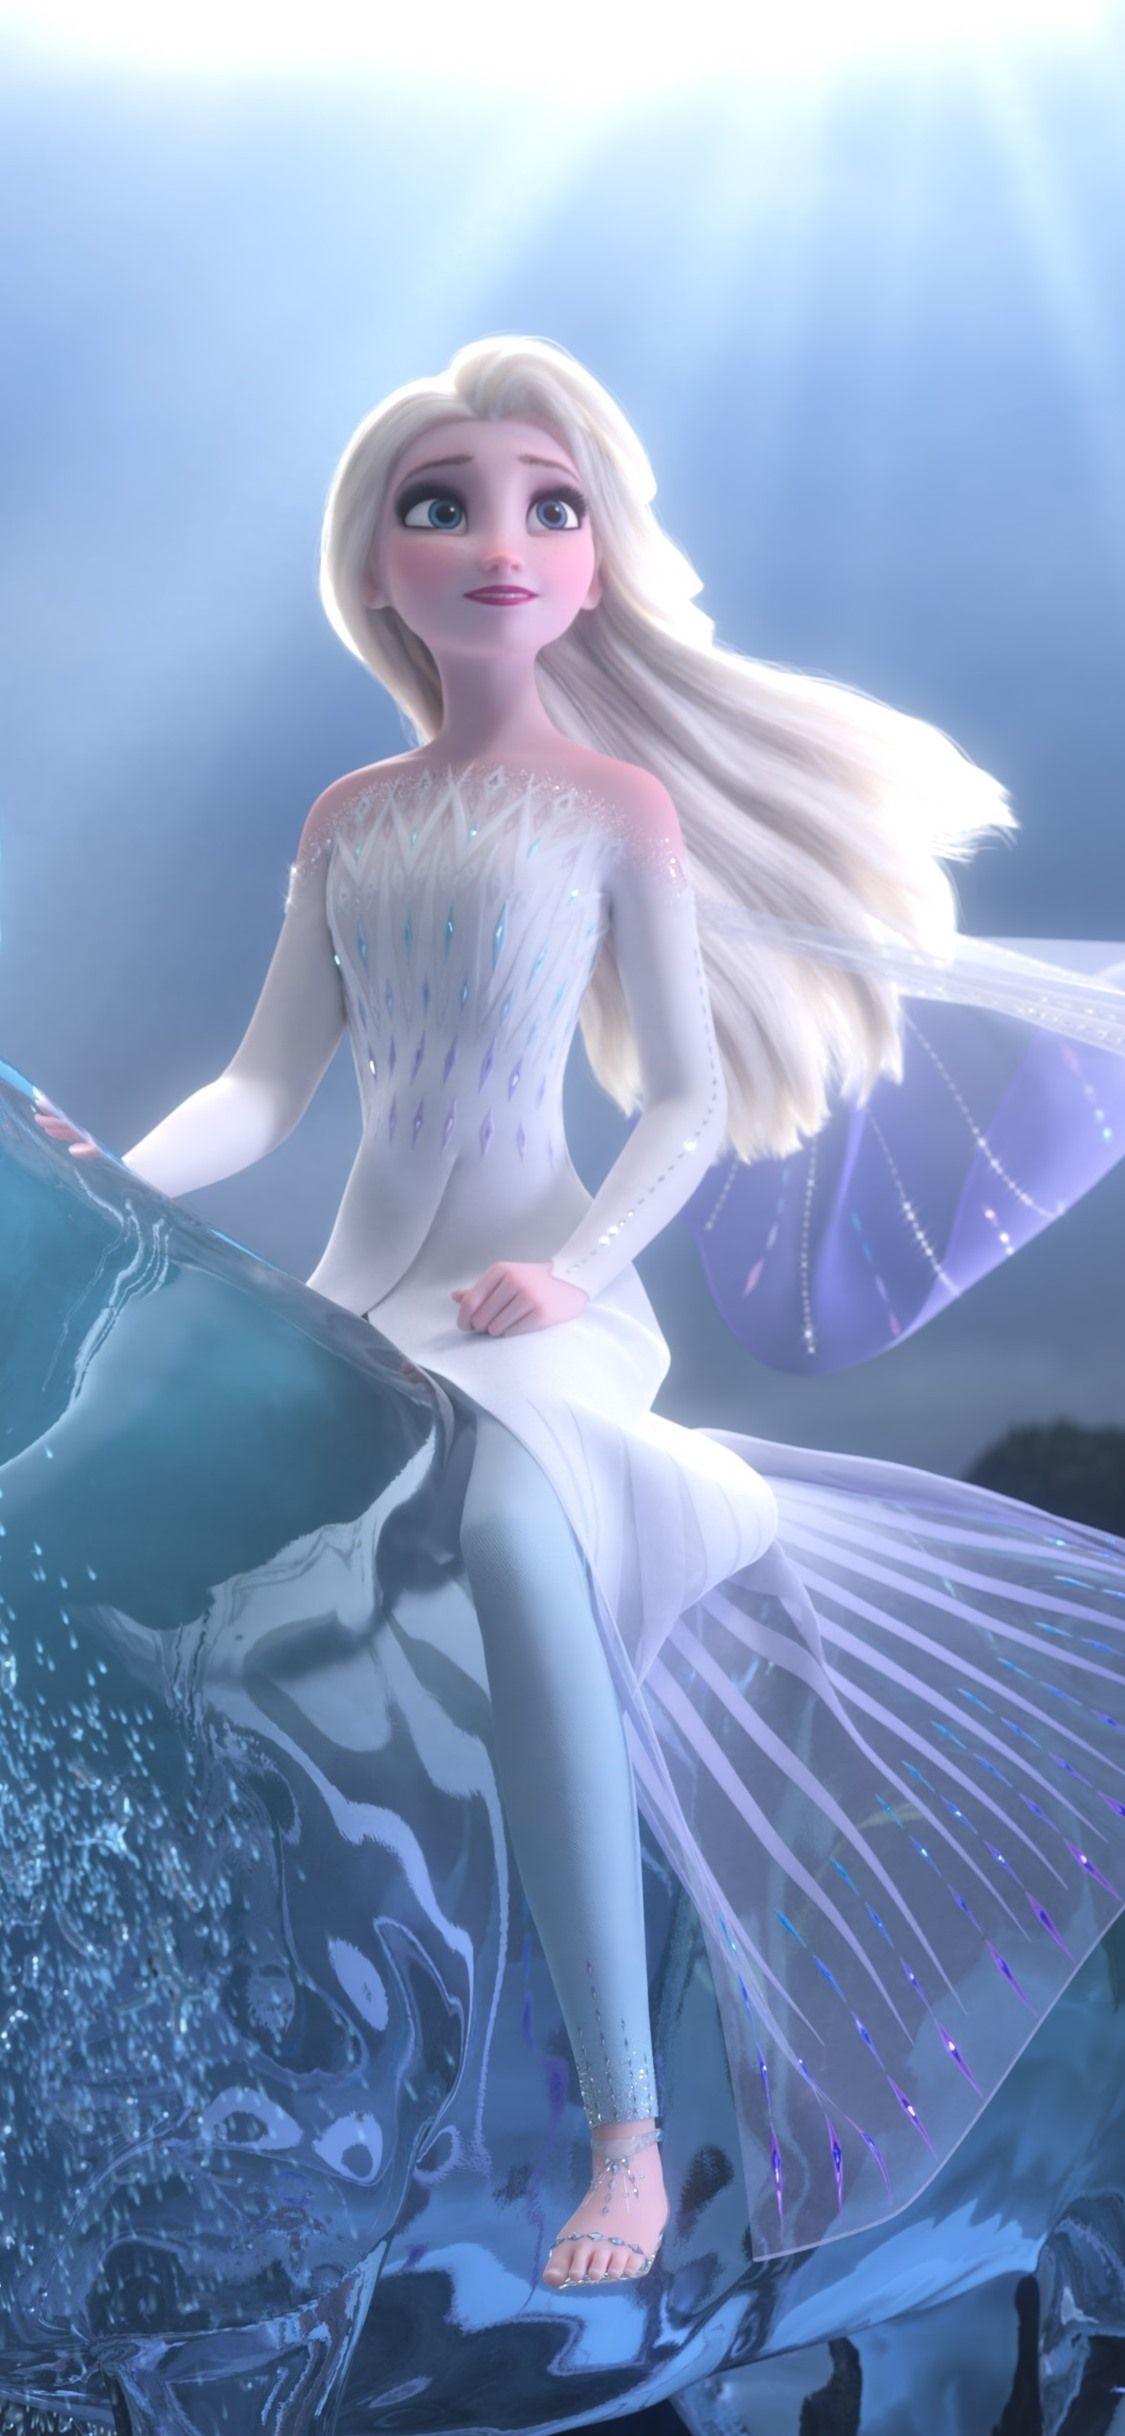 Frozen 2 Elsa Iphone Wallpaper Google Search In 2020 Disney Princess Wallpaper Wallpaper Iphone Disney Princess Elsa Pictures